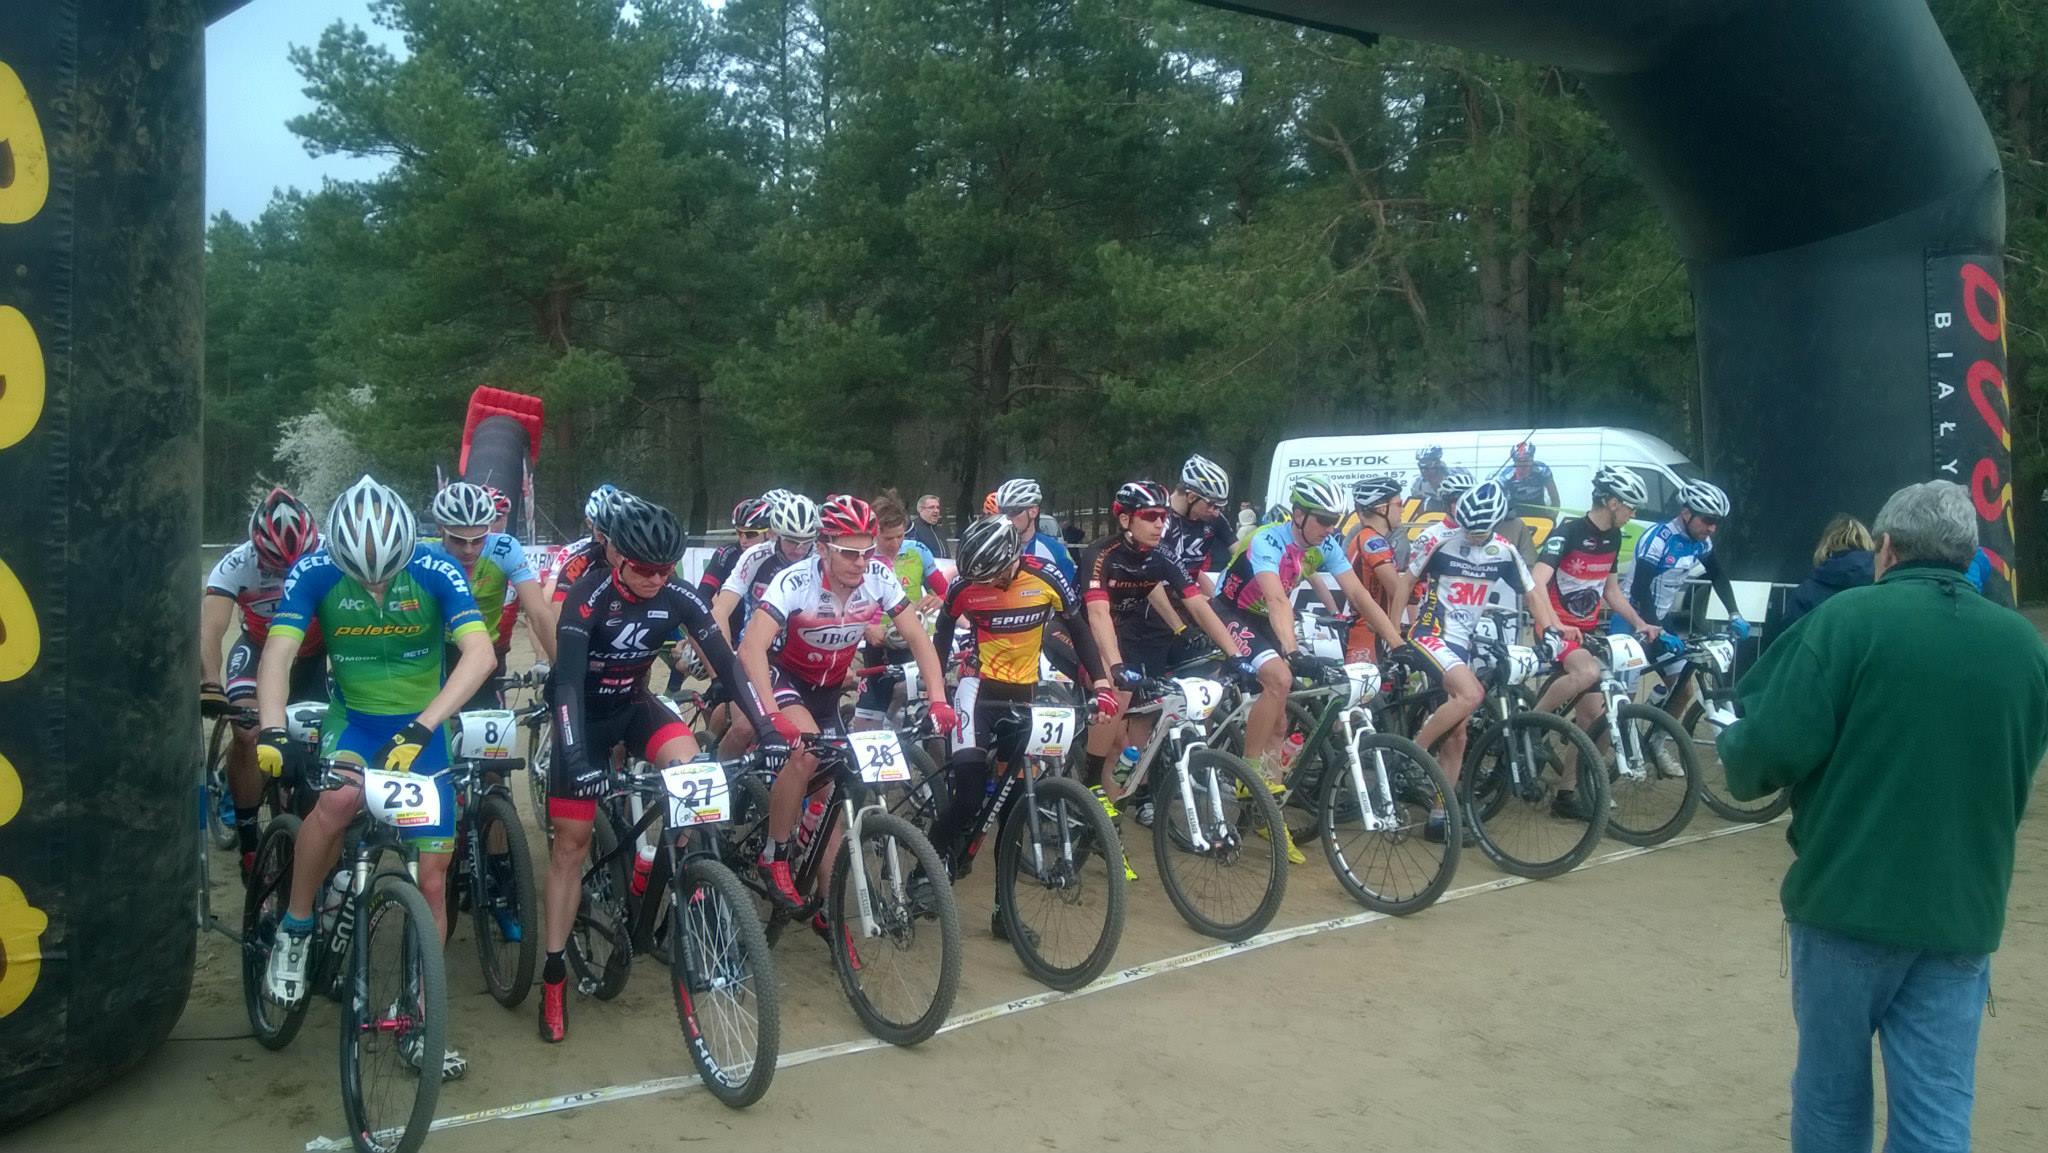 kornel osicki bartłomiej wawak jbg2 kross racing team piotr konwa 4f racing team